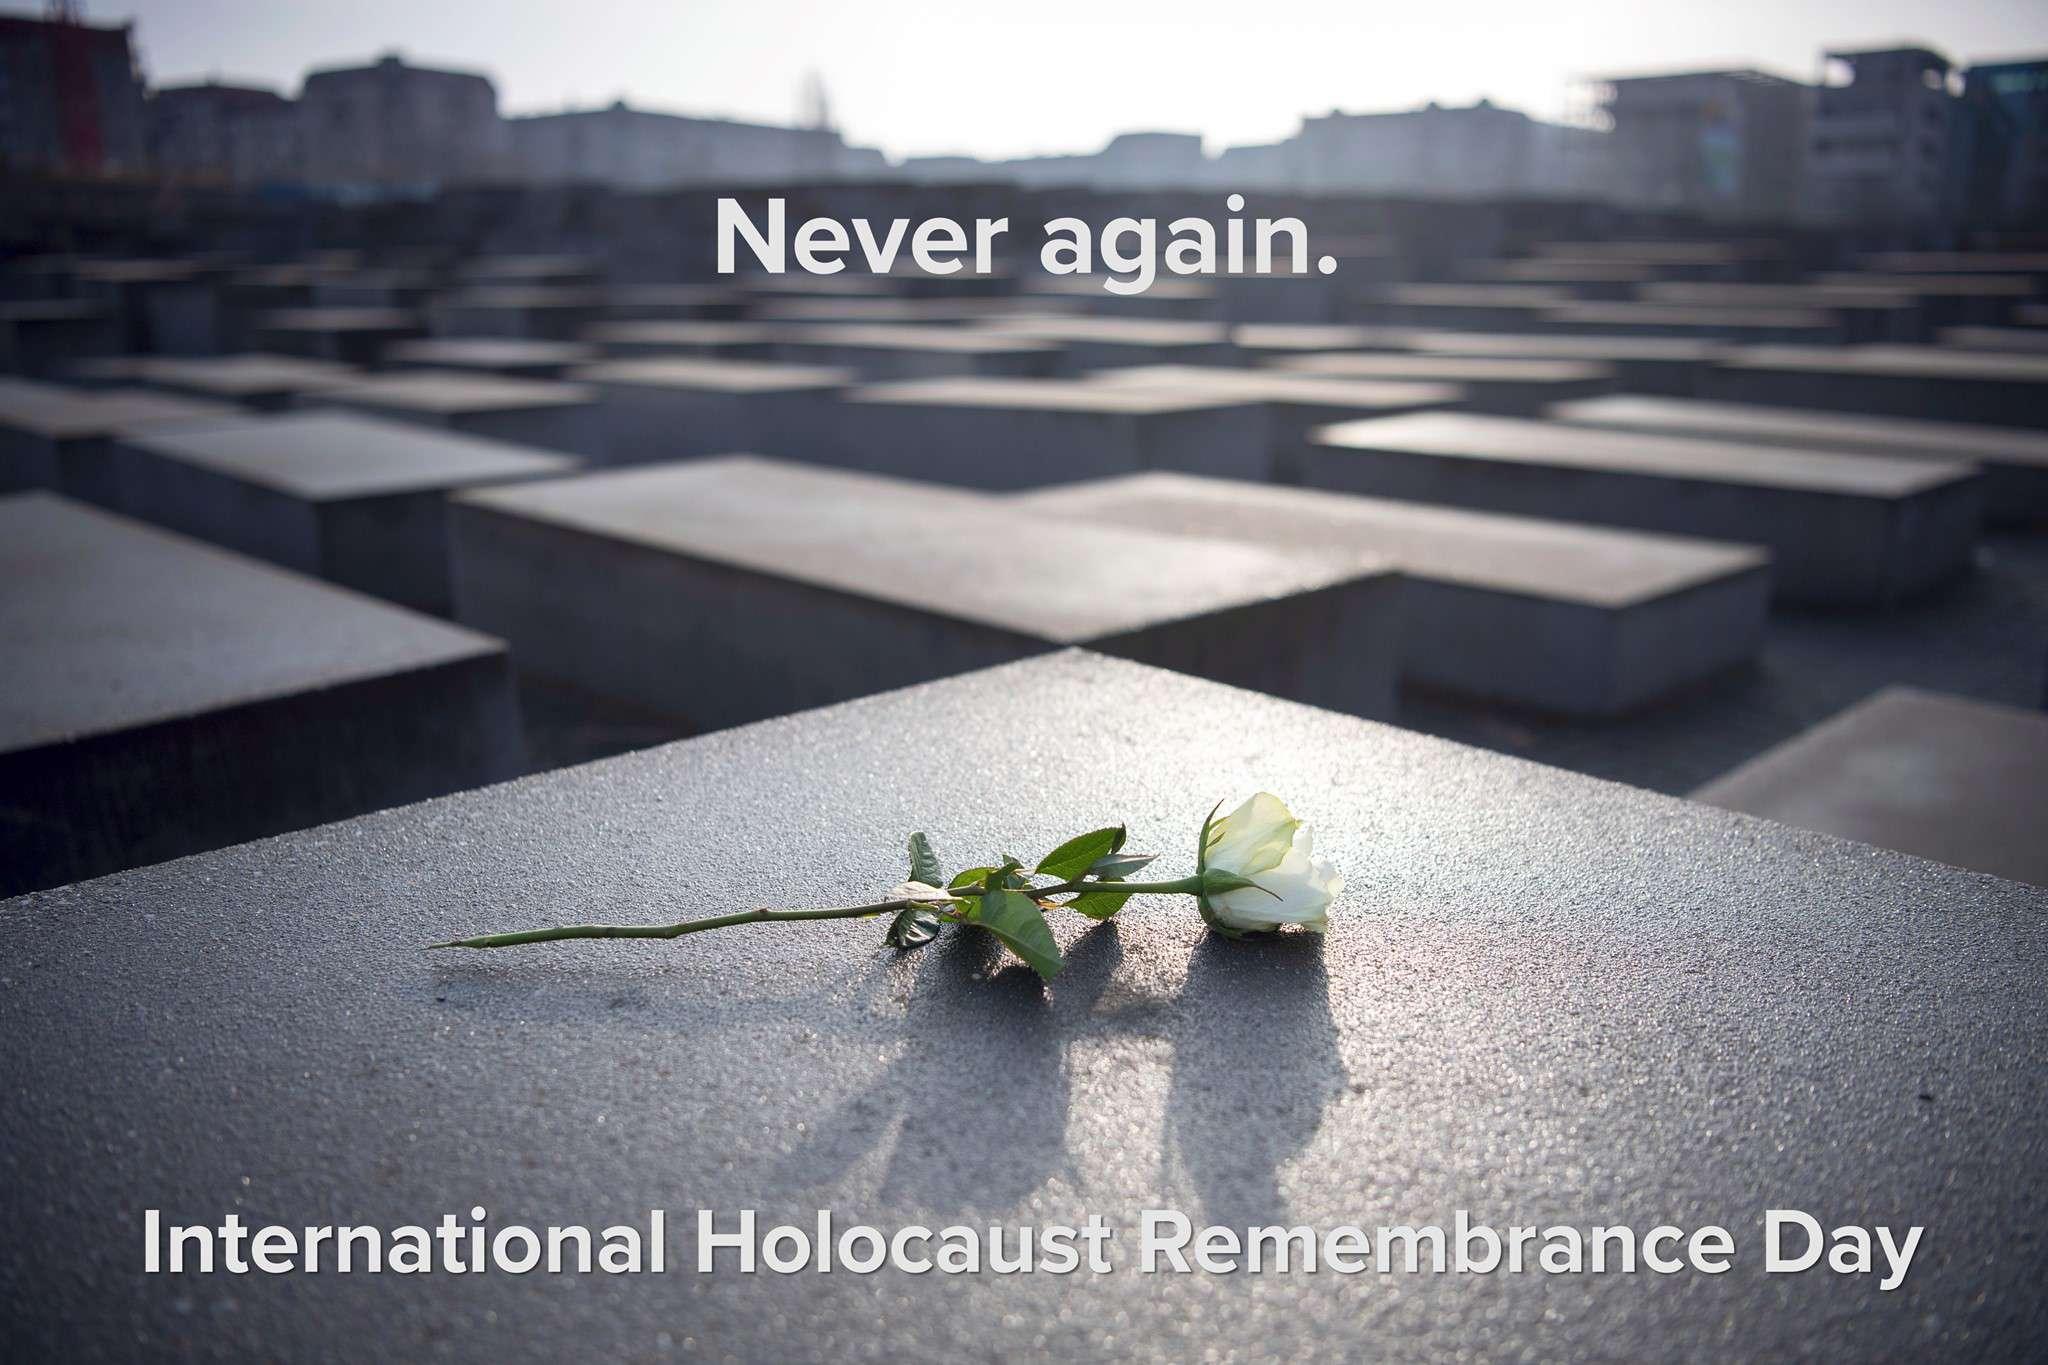 International Holocaust Remembrance Day Wishes Beautiful Image